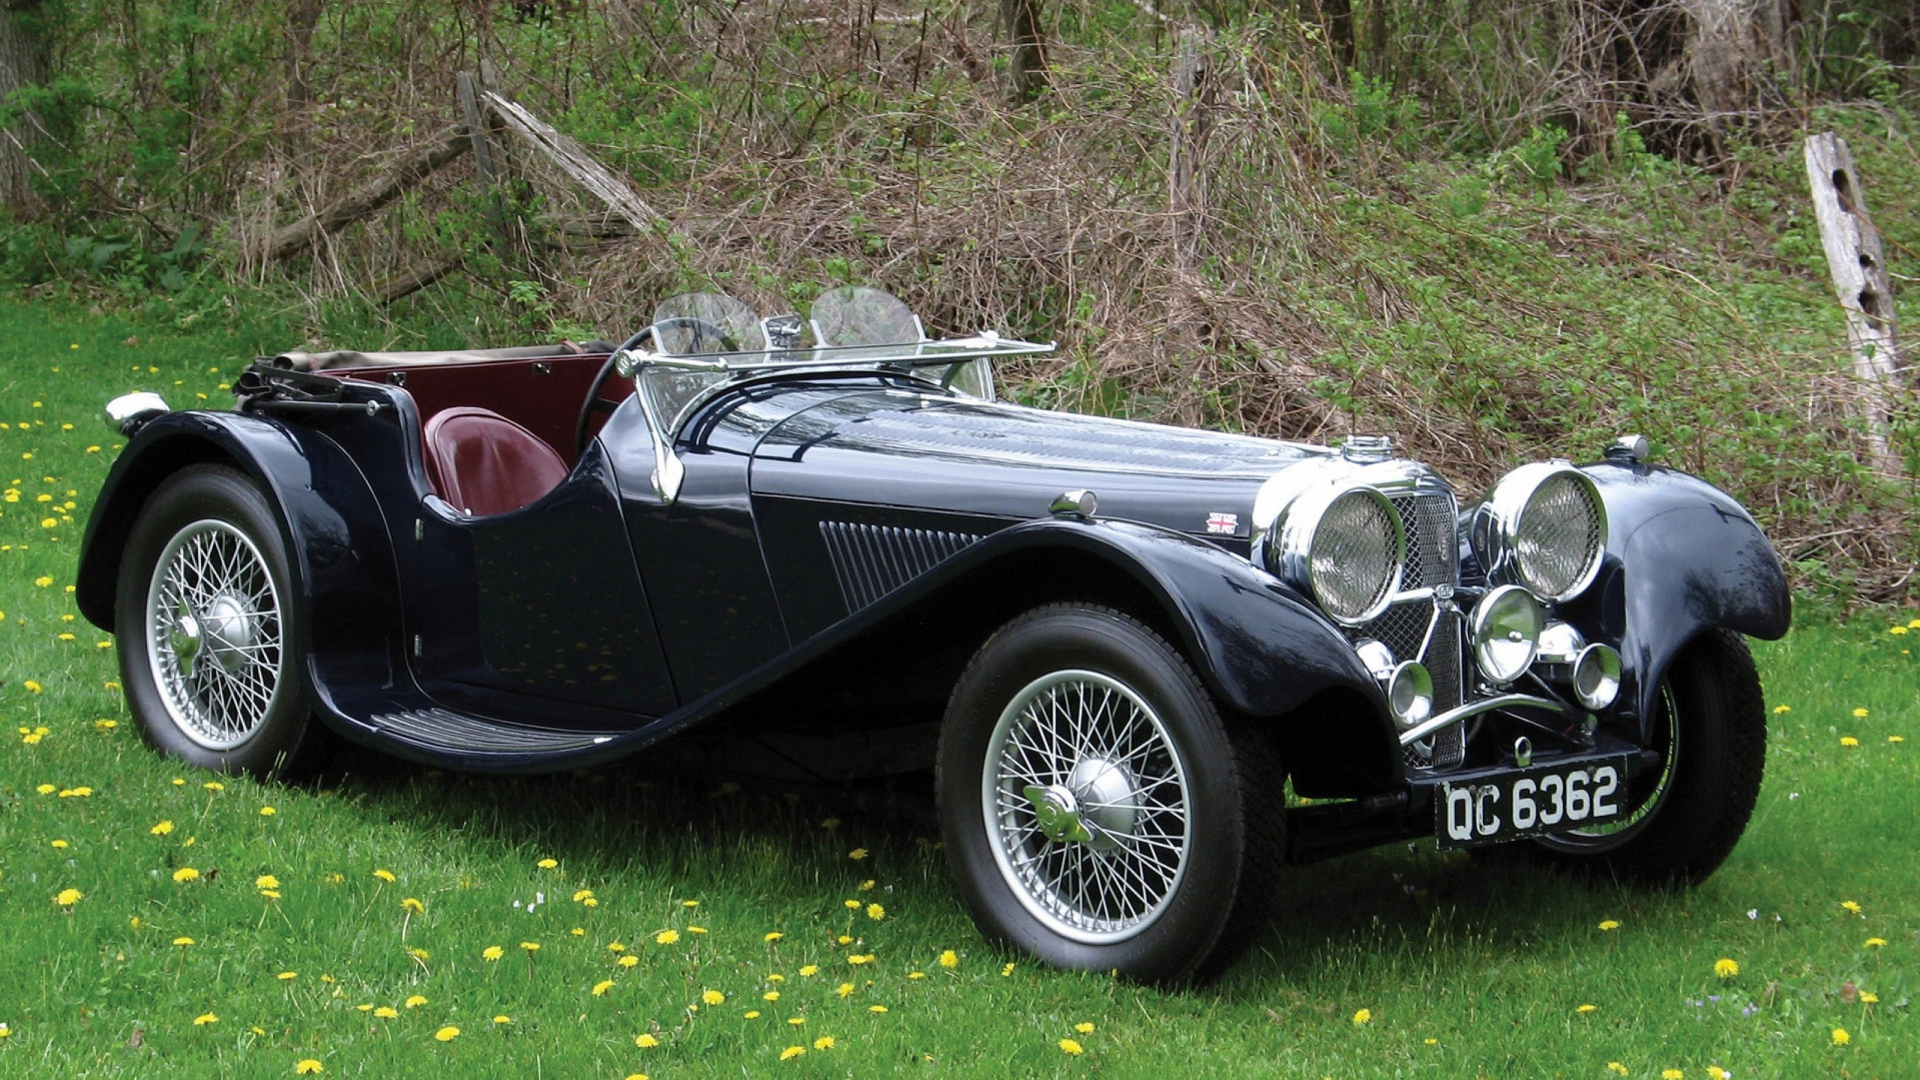 Download Wallpaper 1920x1080 jaguar, sport car, vintage car Full HD ...